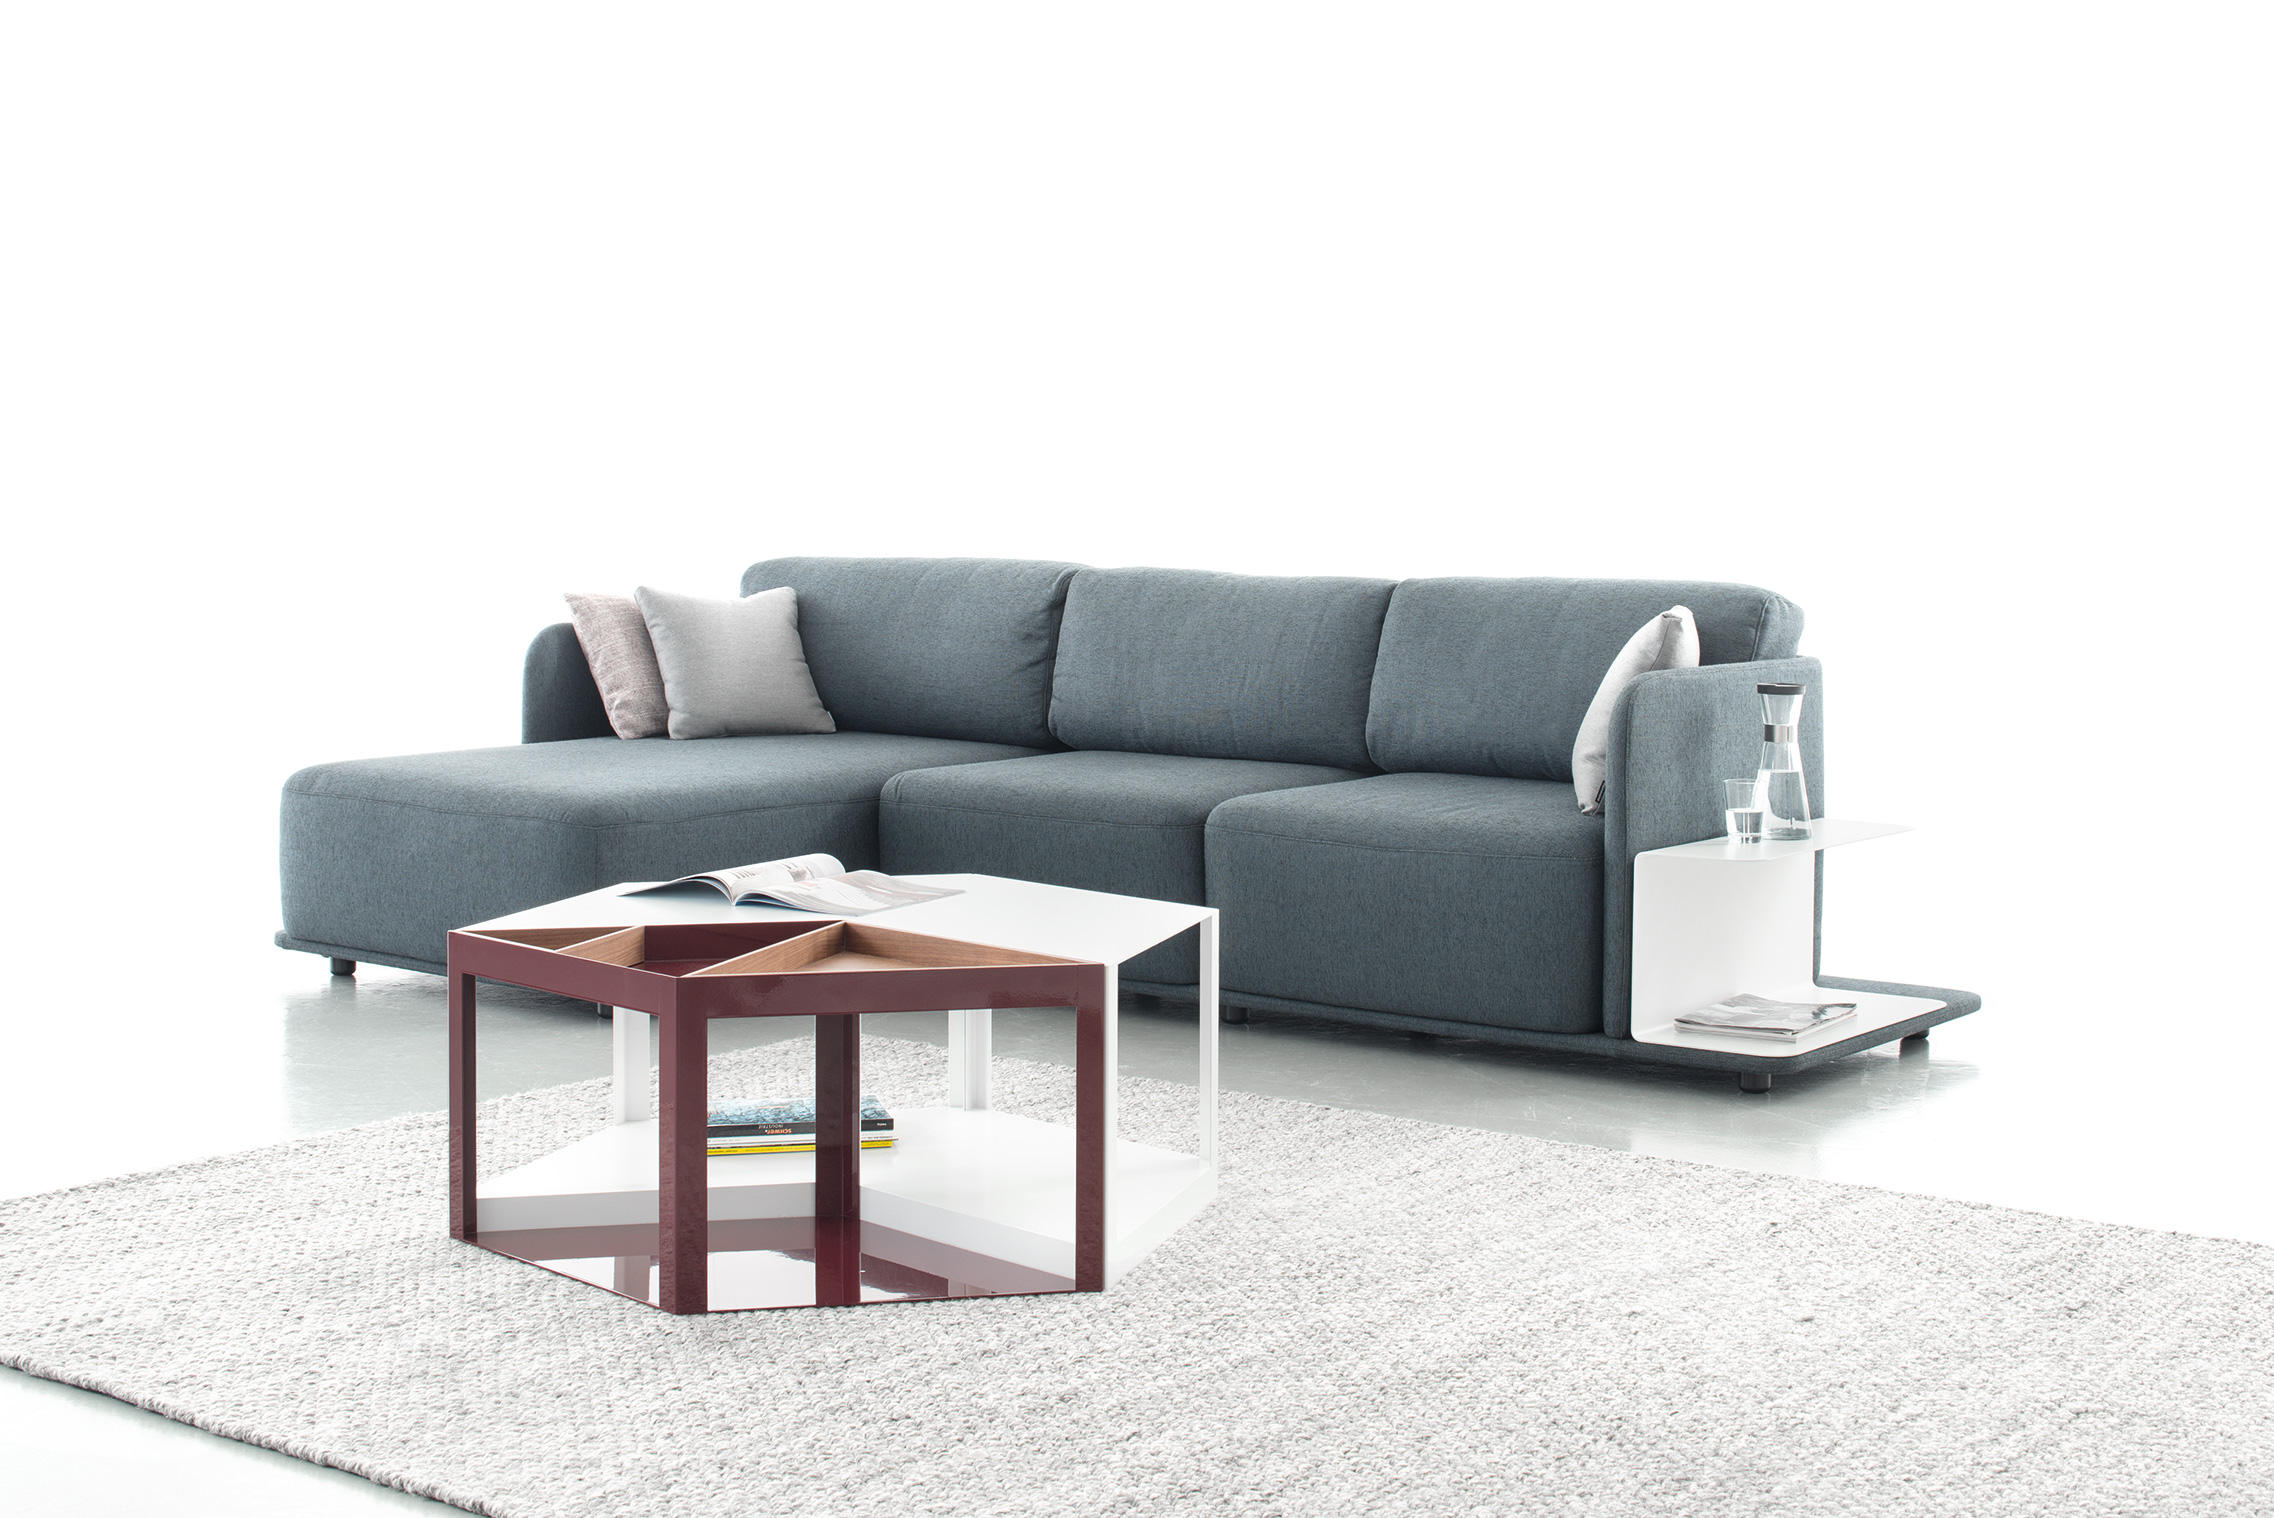 molis sofa - sofas from conmoto   architonic